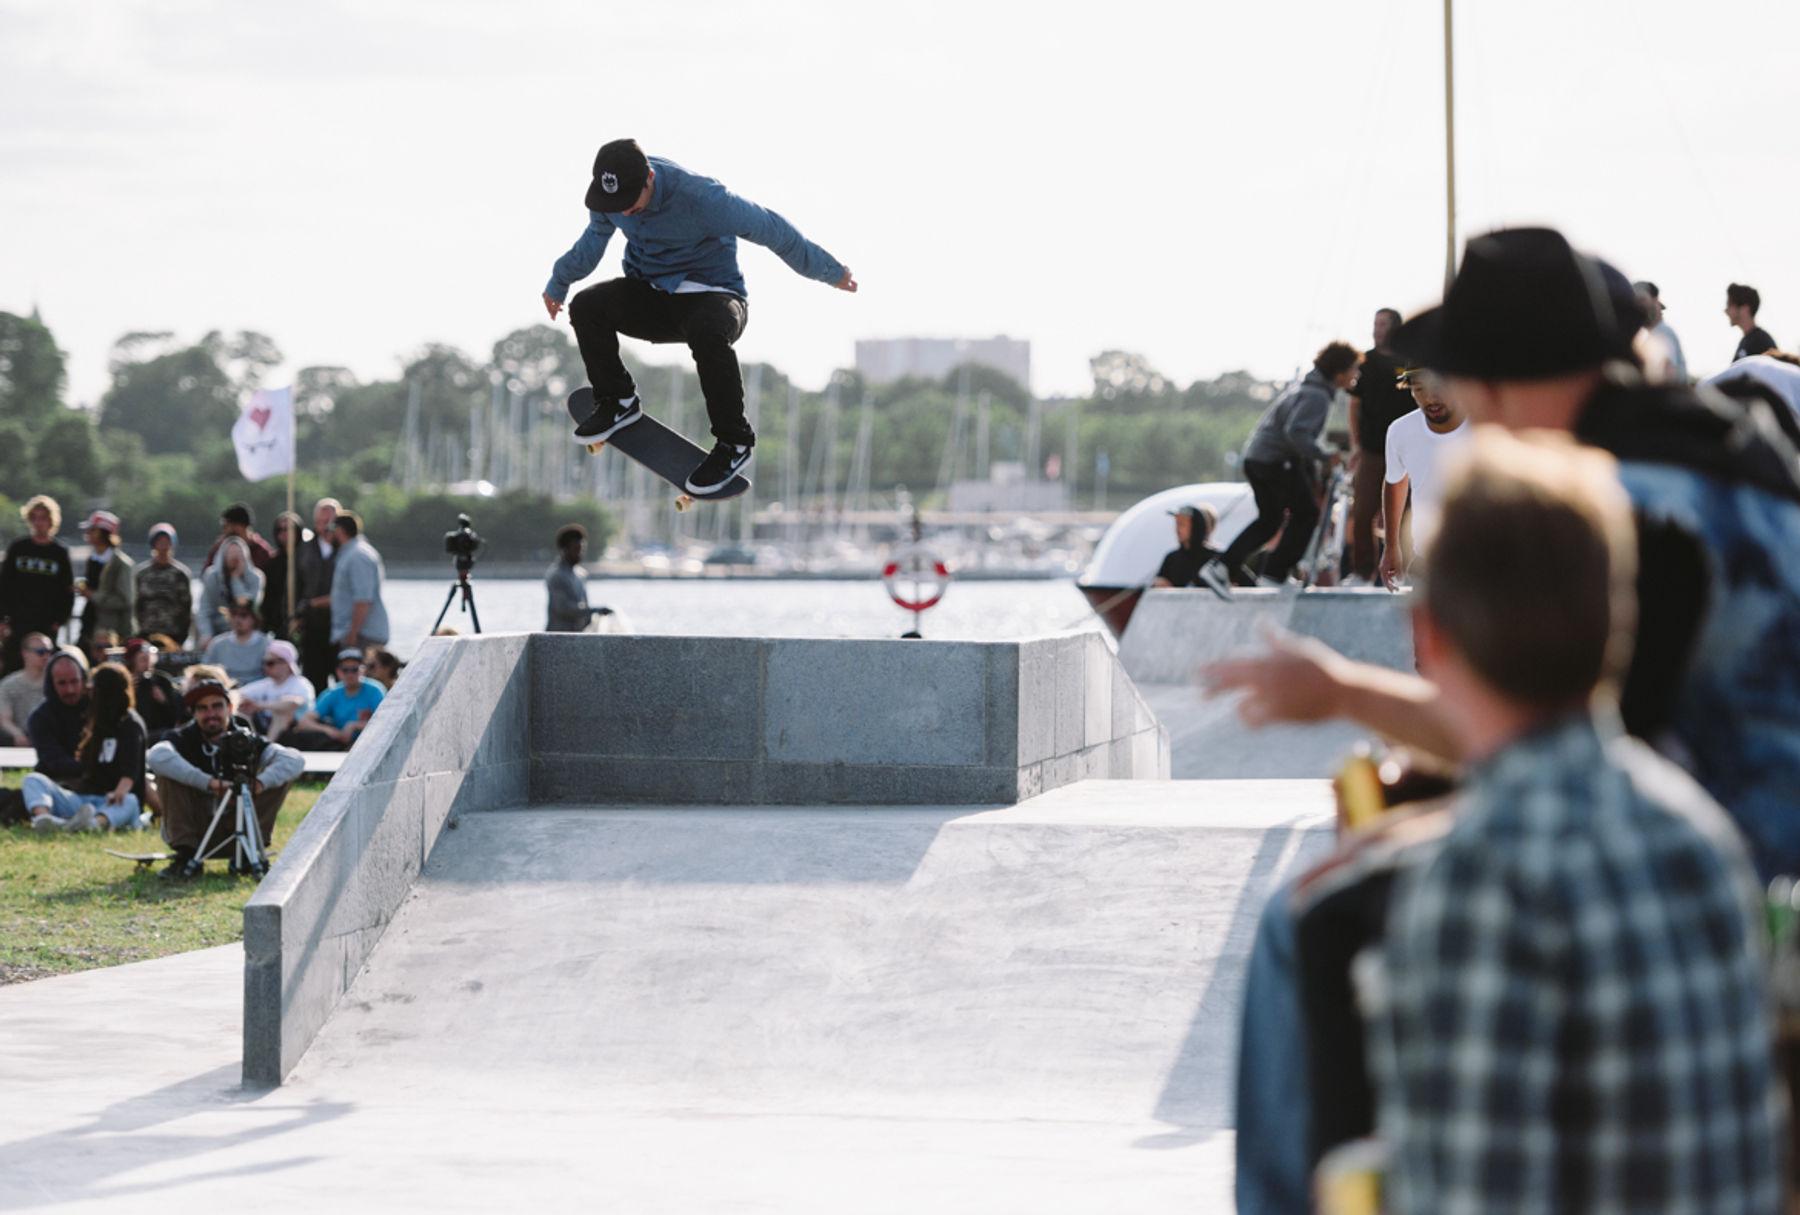 _IHC5867e-Luan-Oliveira-Bs-360-Nike-SB-Copenhagen-Open-Day-4-July-2015-Photographer-Maksim-Kalanep